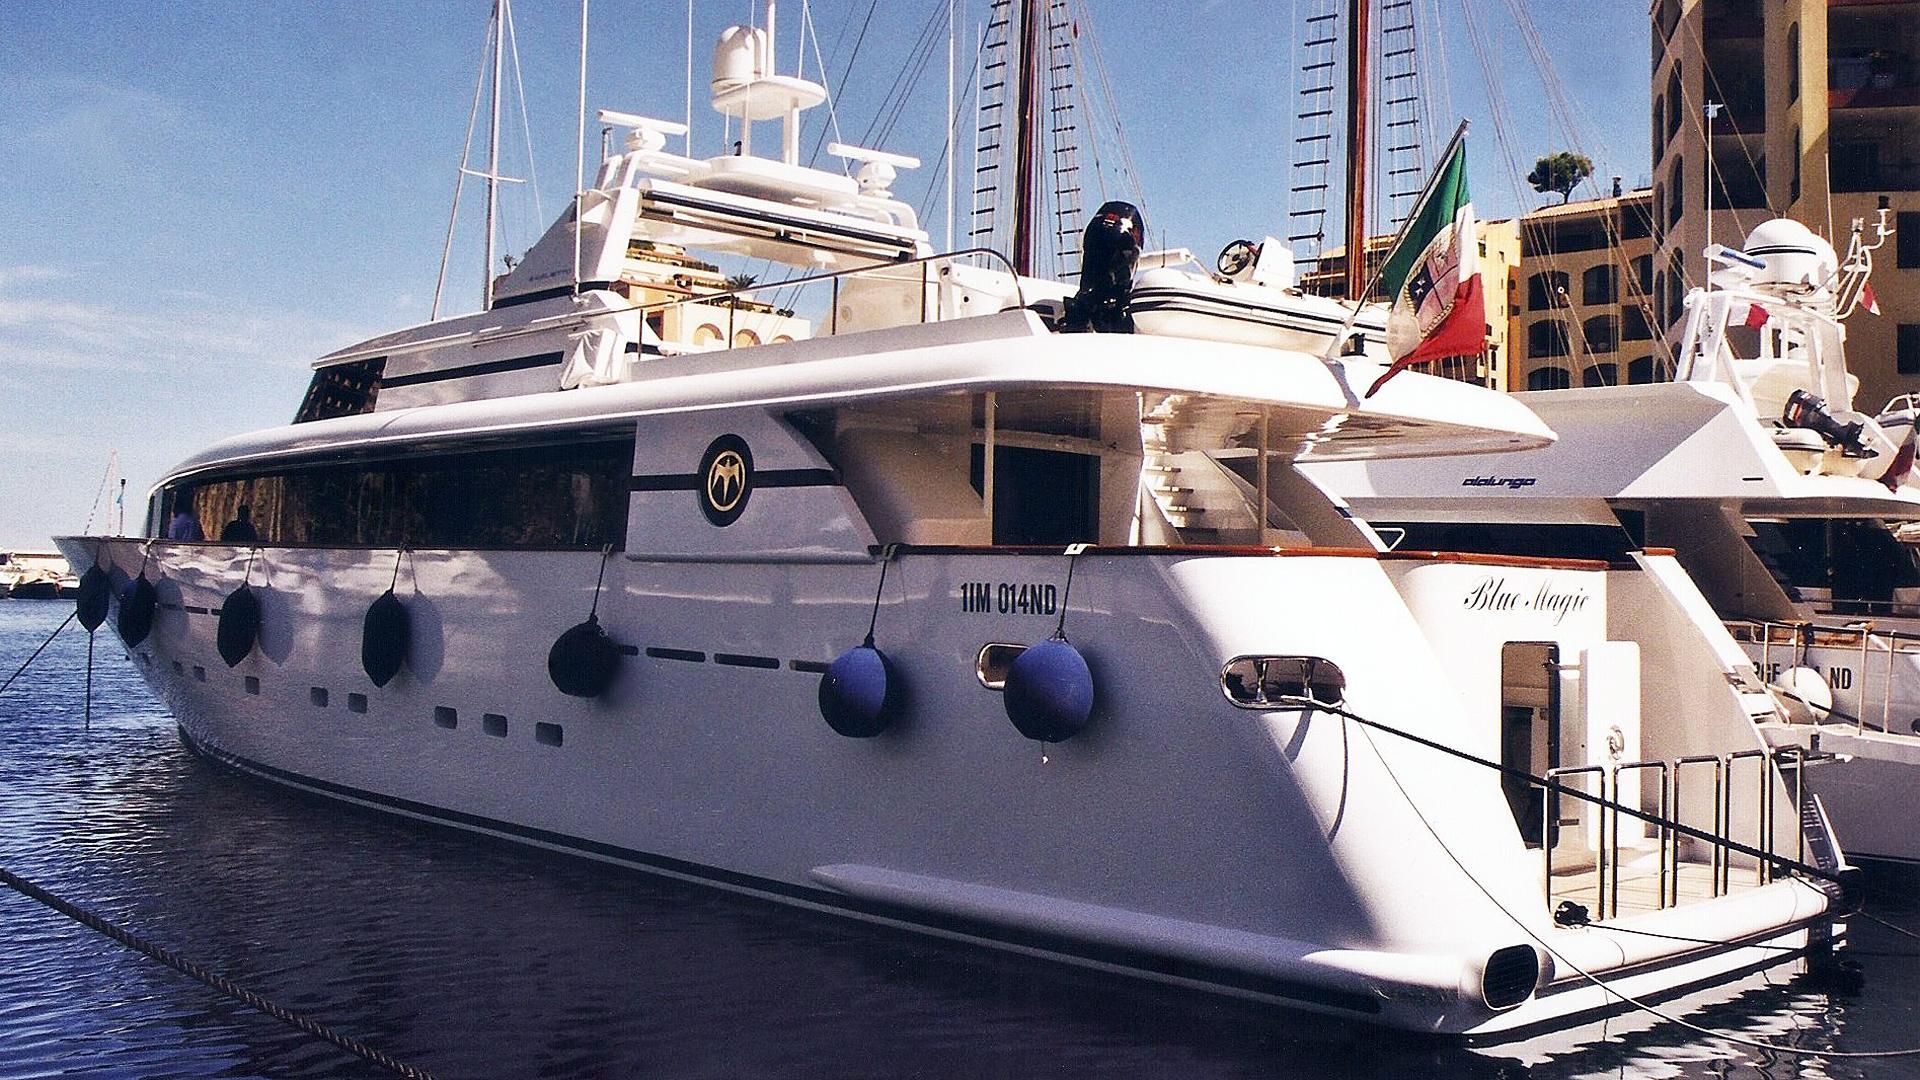 blue-magic-motor-yacht-baglietto-2001-32m-stern